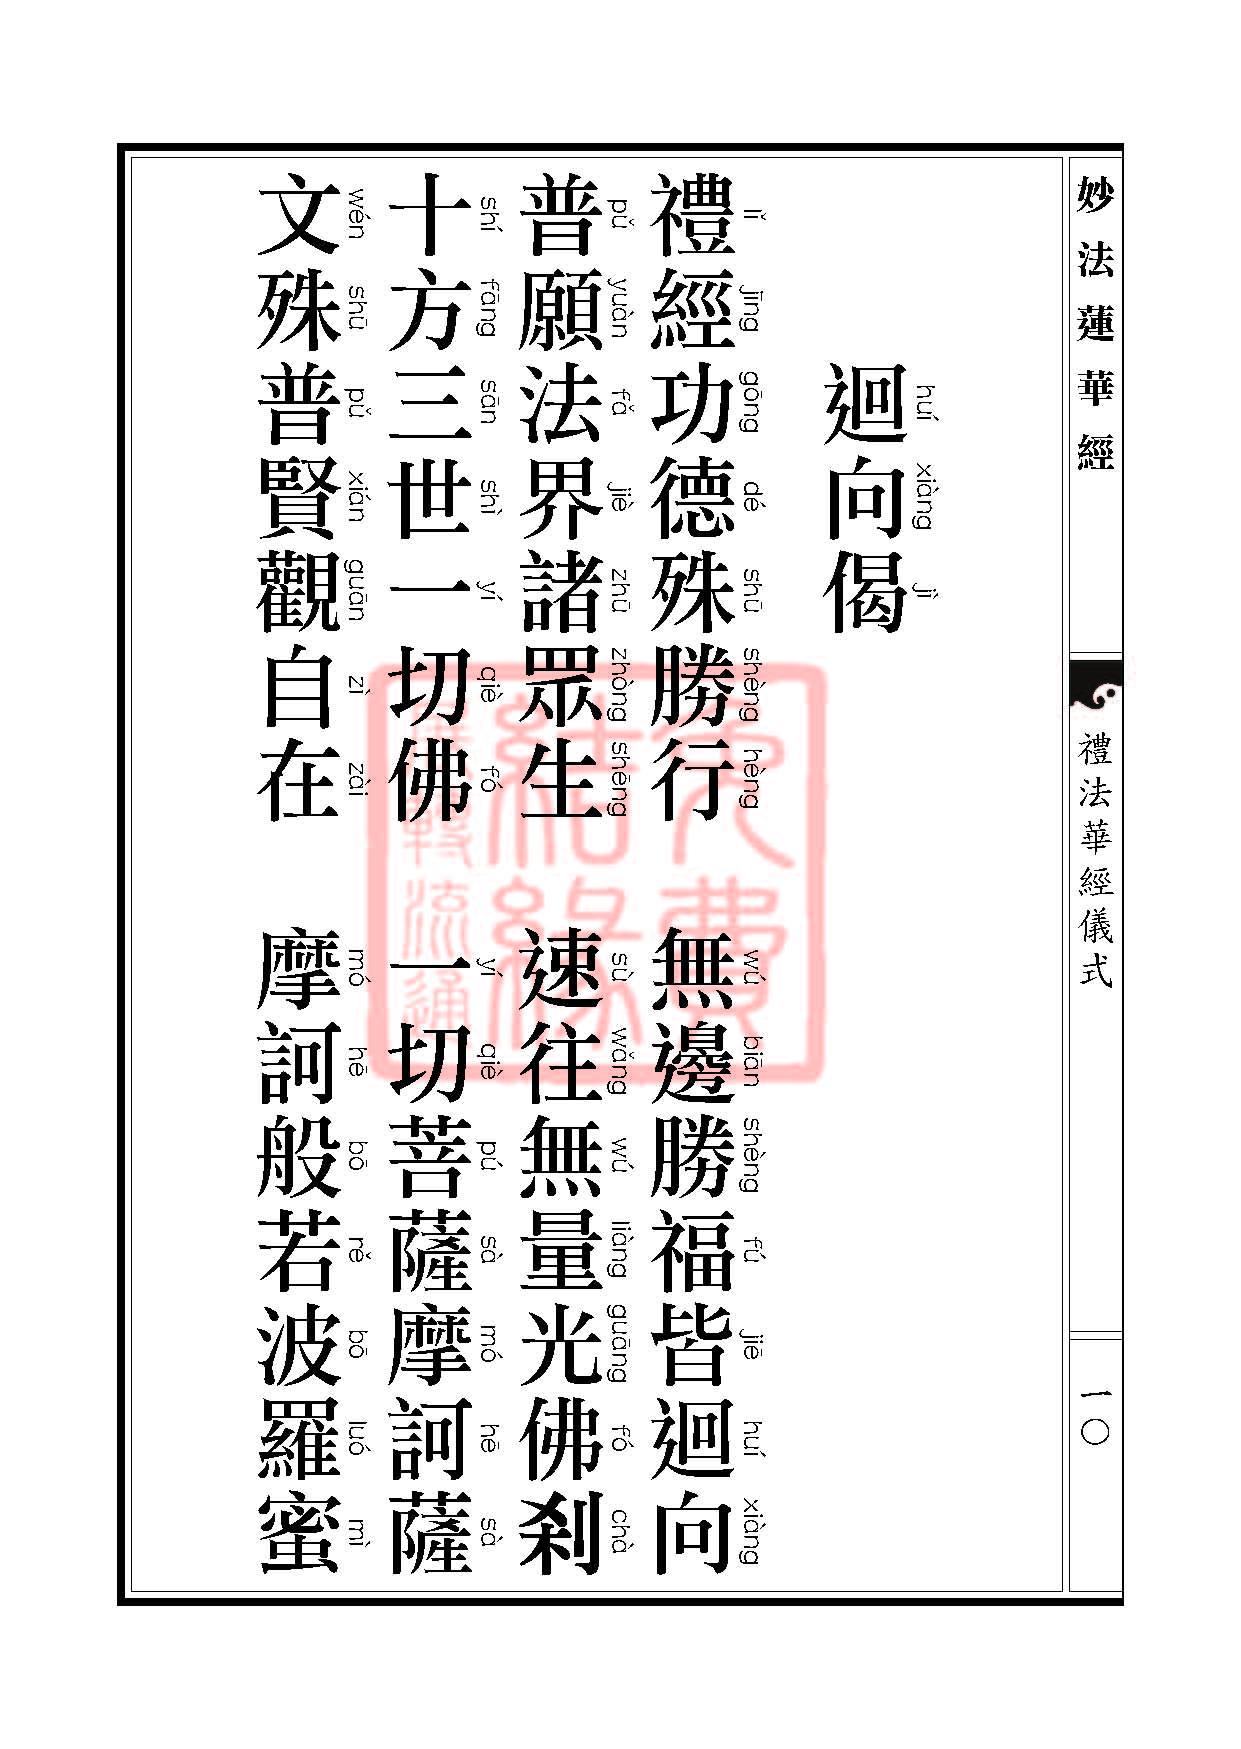 Book_FHJ_HK-A6-PY_Web_页面_010.jpg